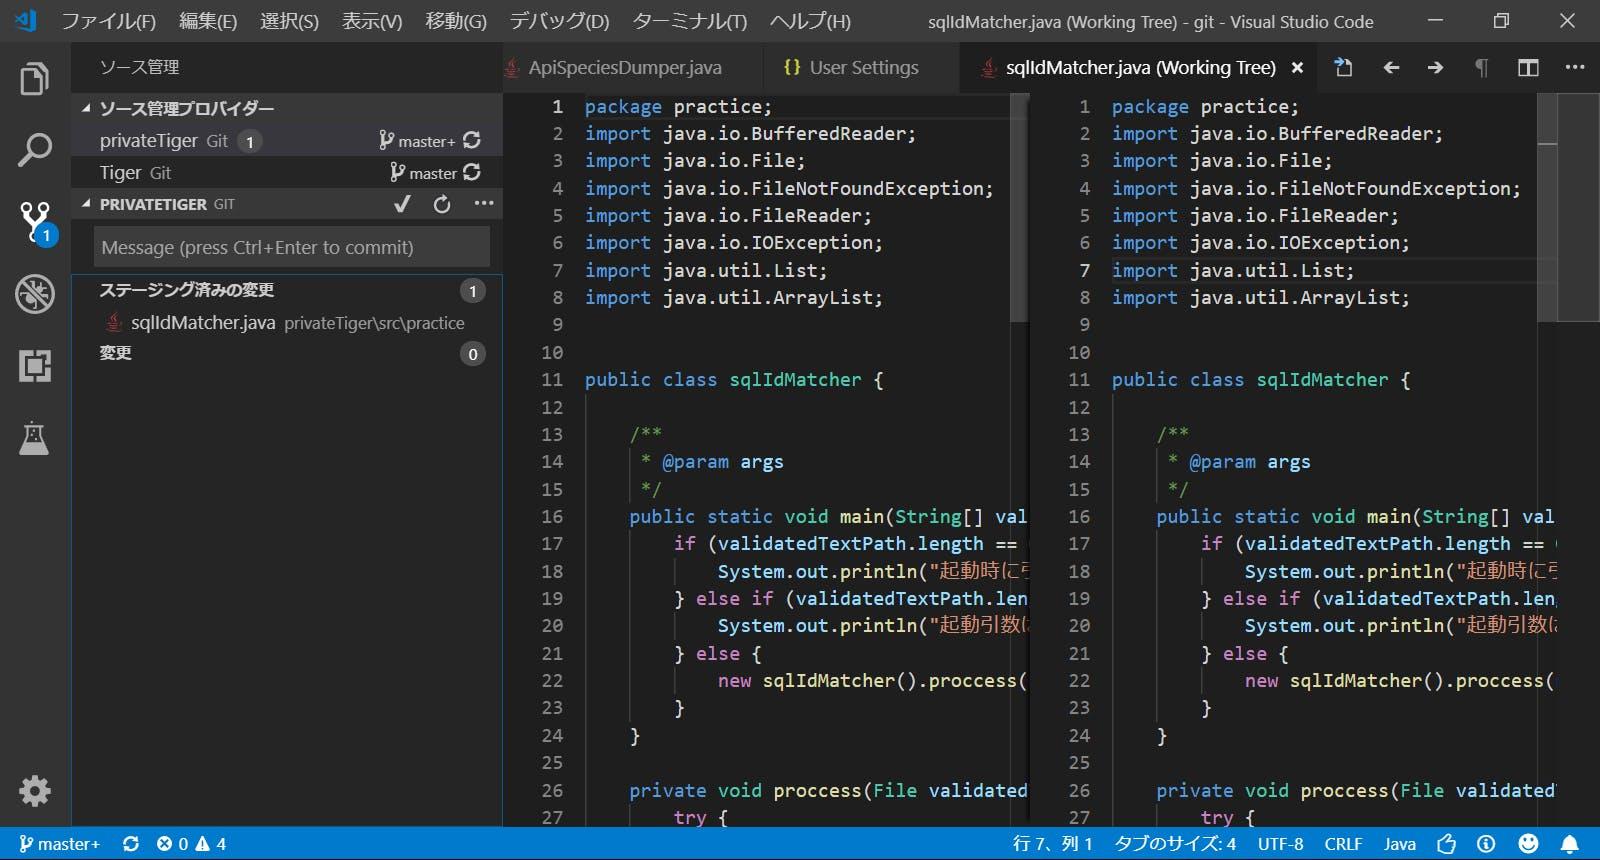 SnapCrab_sqlIdMatcherjava (Working Tree) - git - Visual Studio Code_2019-1-19_23-51-16_No-00.png